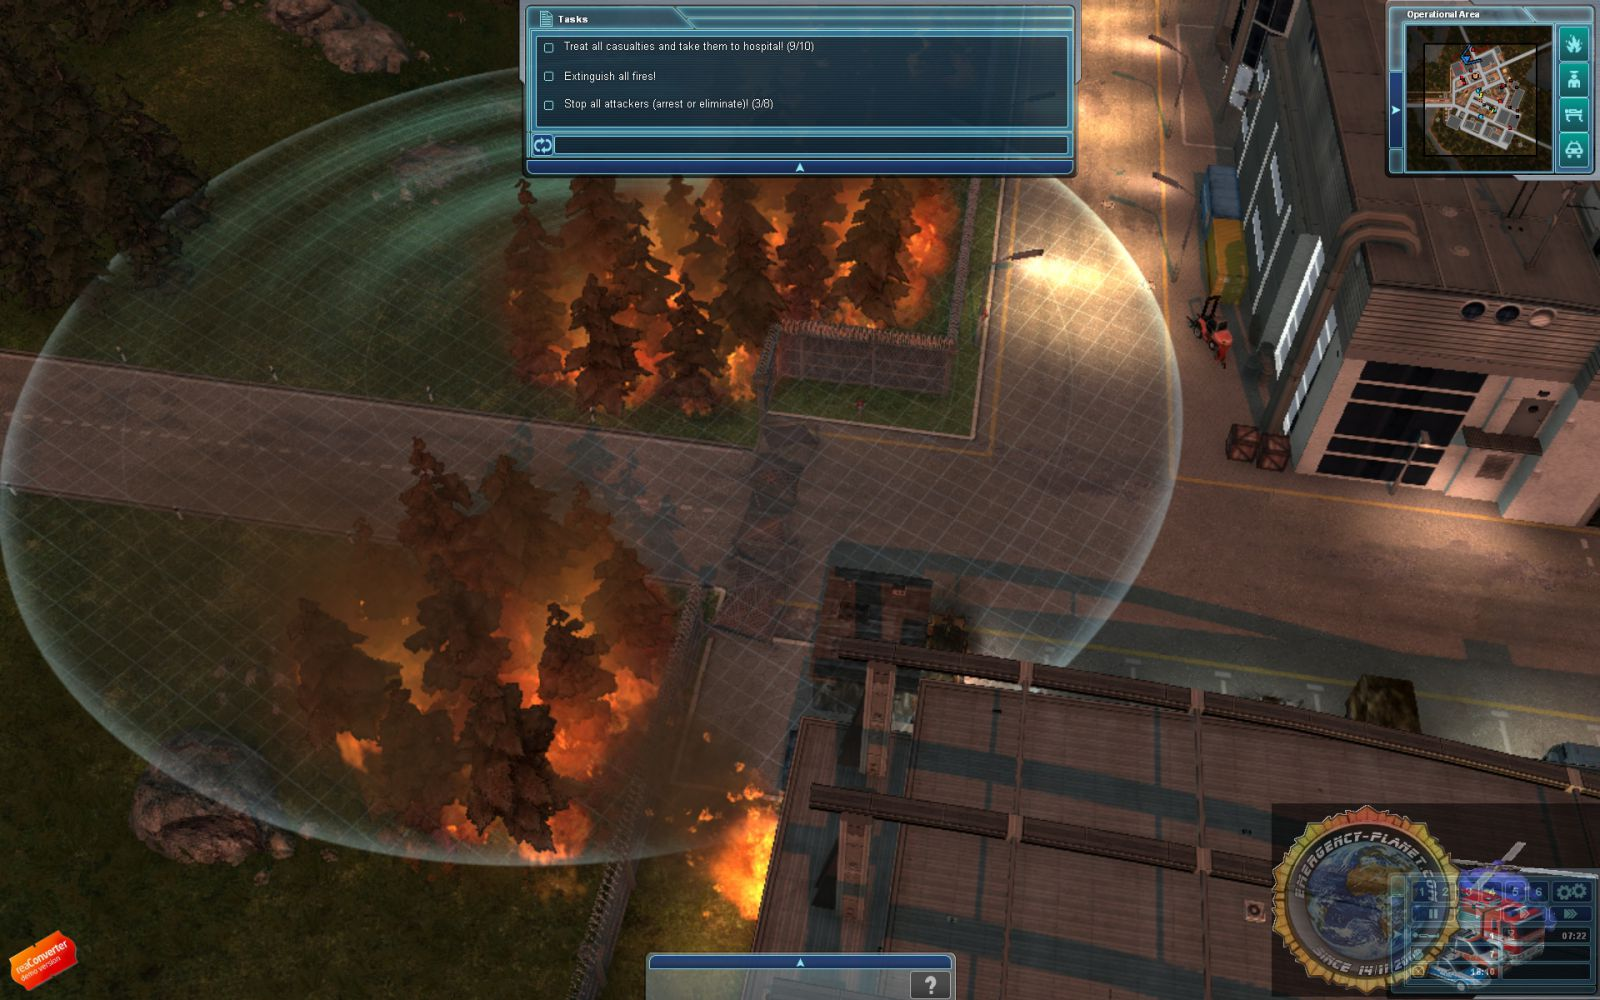 Emergency 2014 Screenshot 34